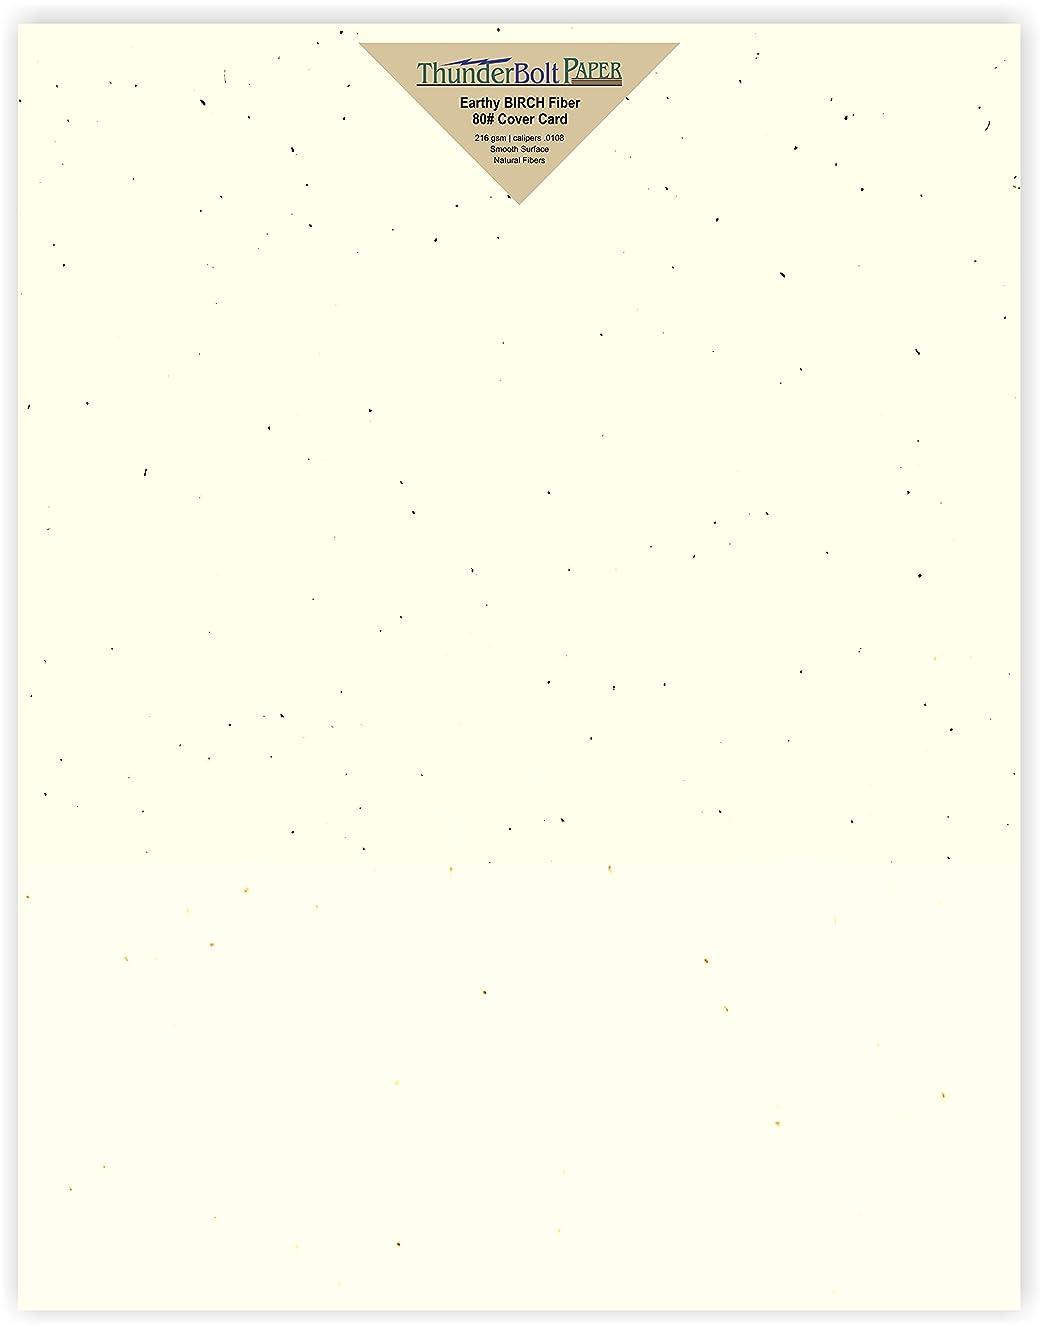 25 Earthy Birch Fiber 80# Cover Paper Sheets - 11